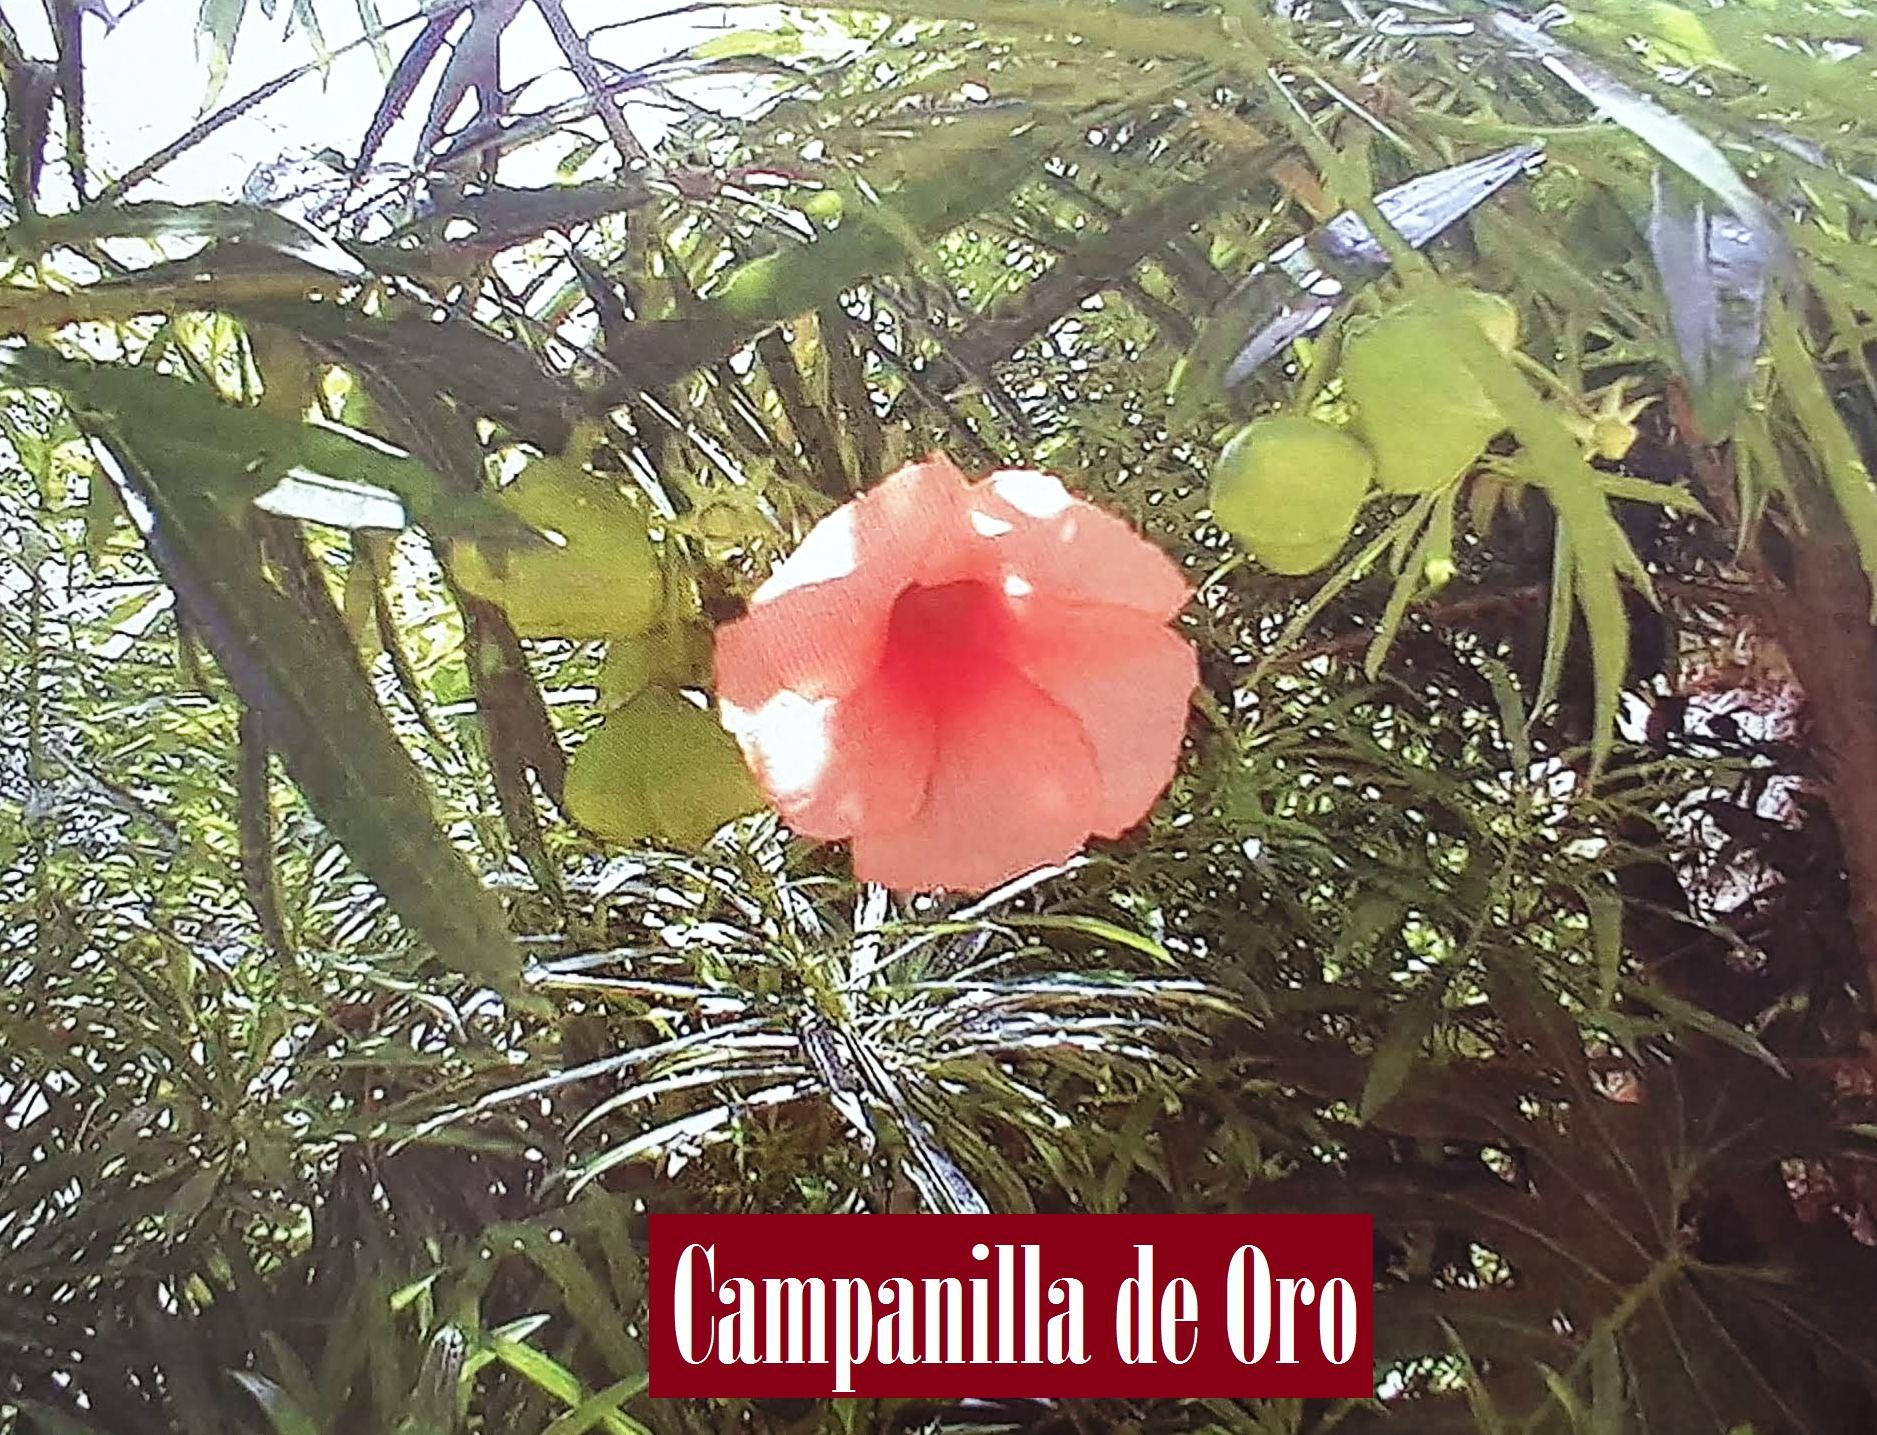 CAMPANILLA DE ORO, AJ KITS, KAAN LOOL (MAYA)